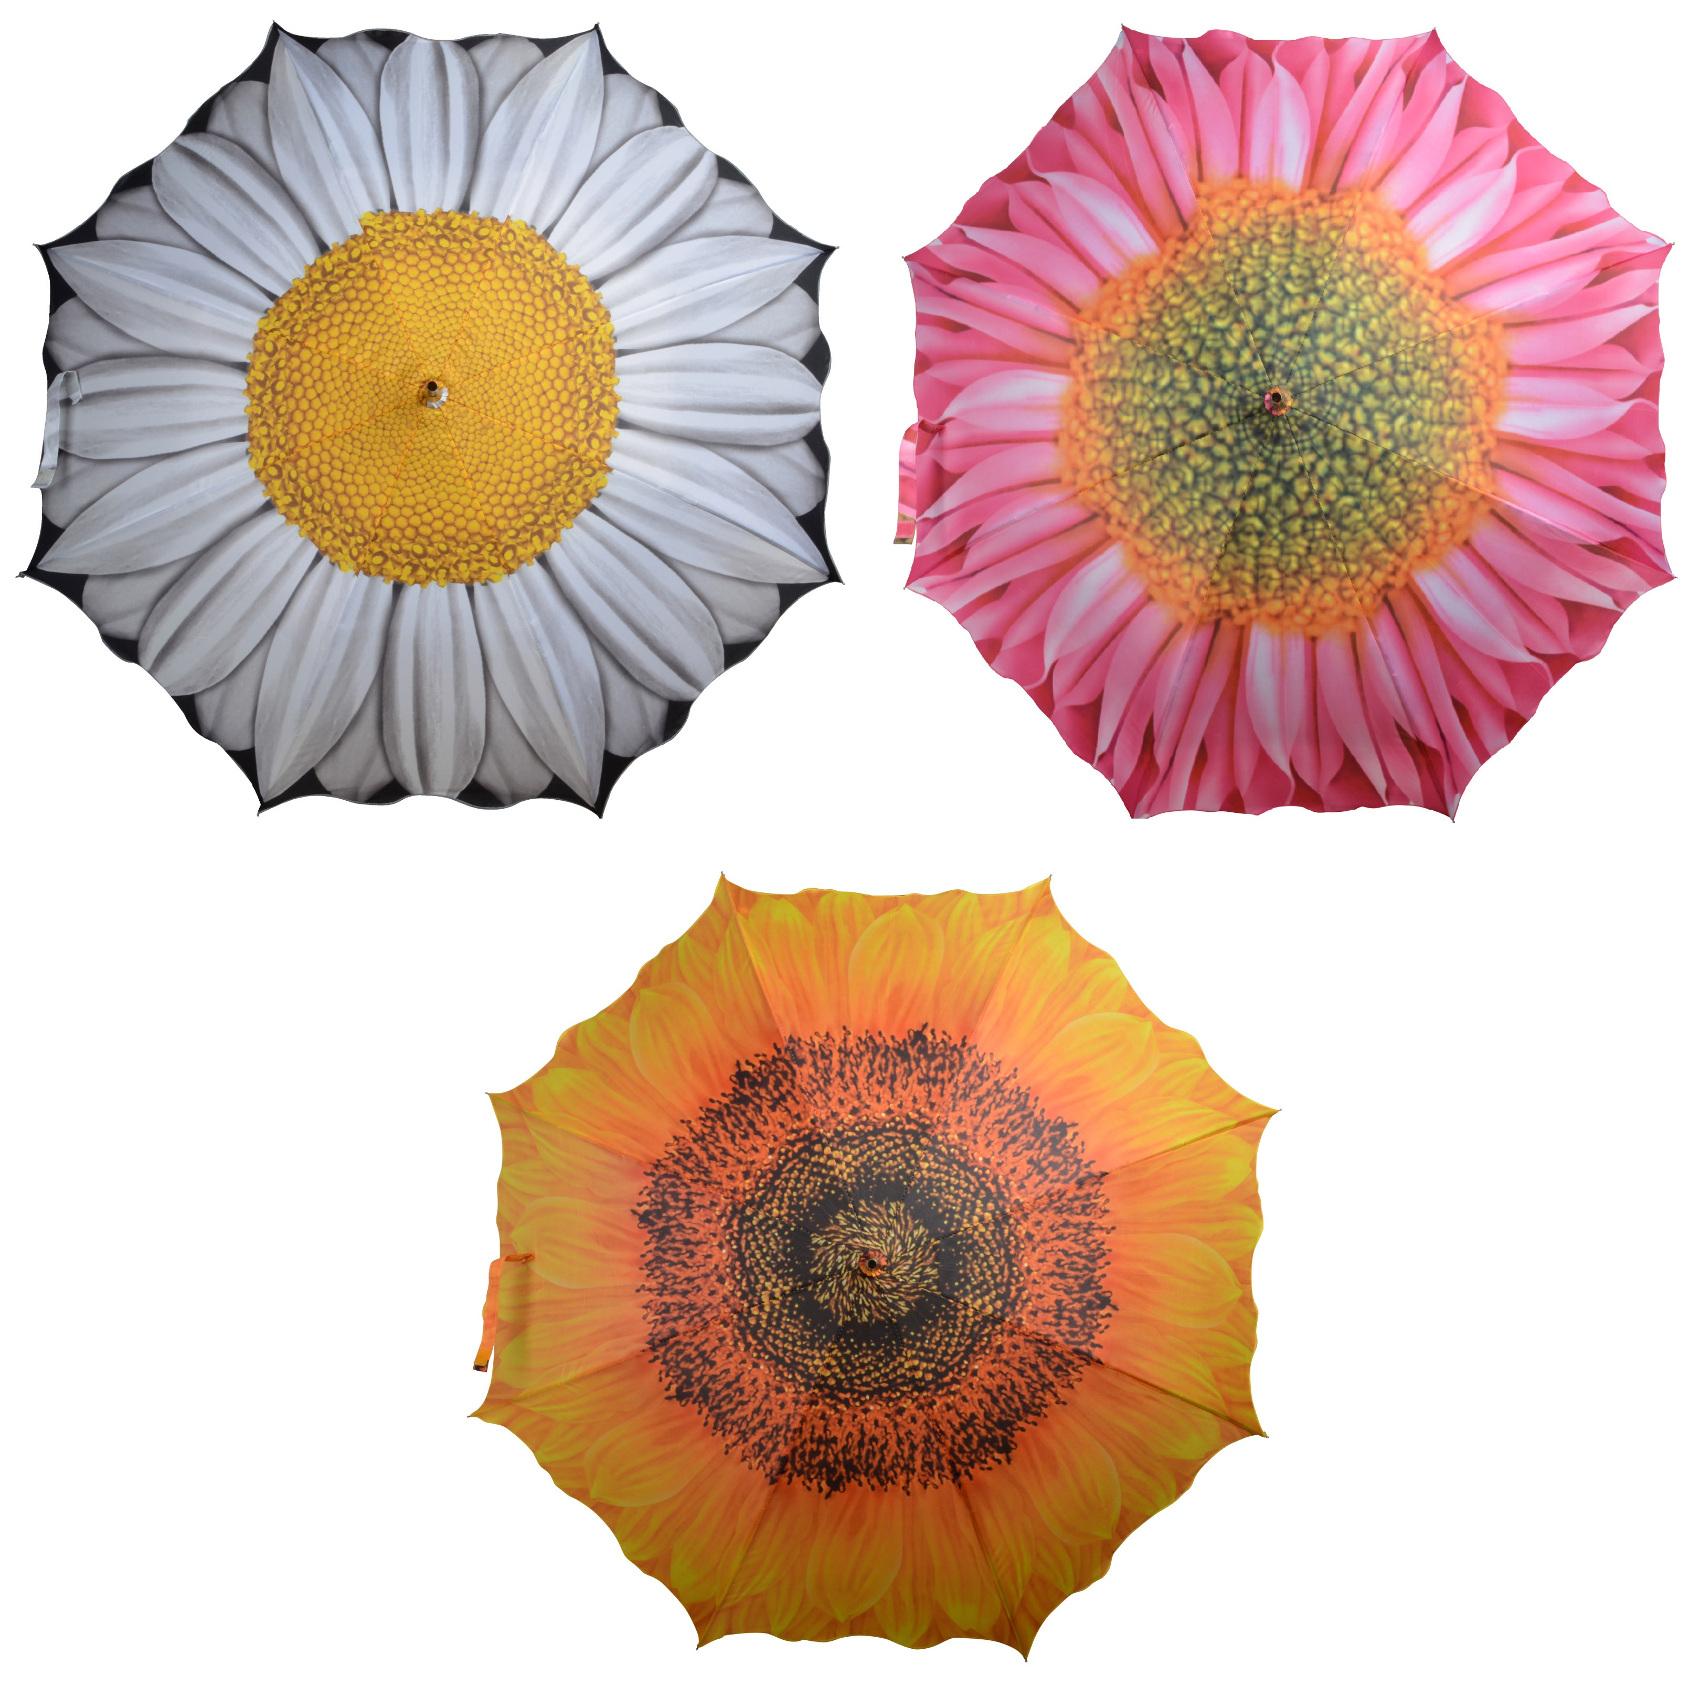 Floral Umbrella Nylon Daisy Sunflower Pink Gerbera Flower